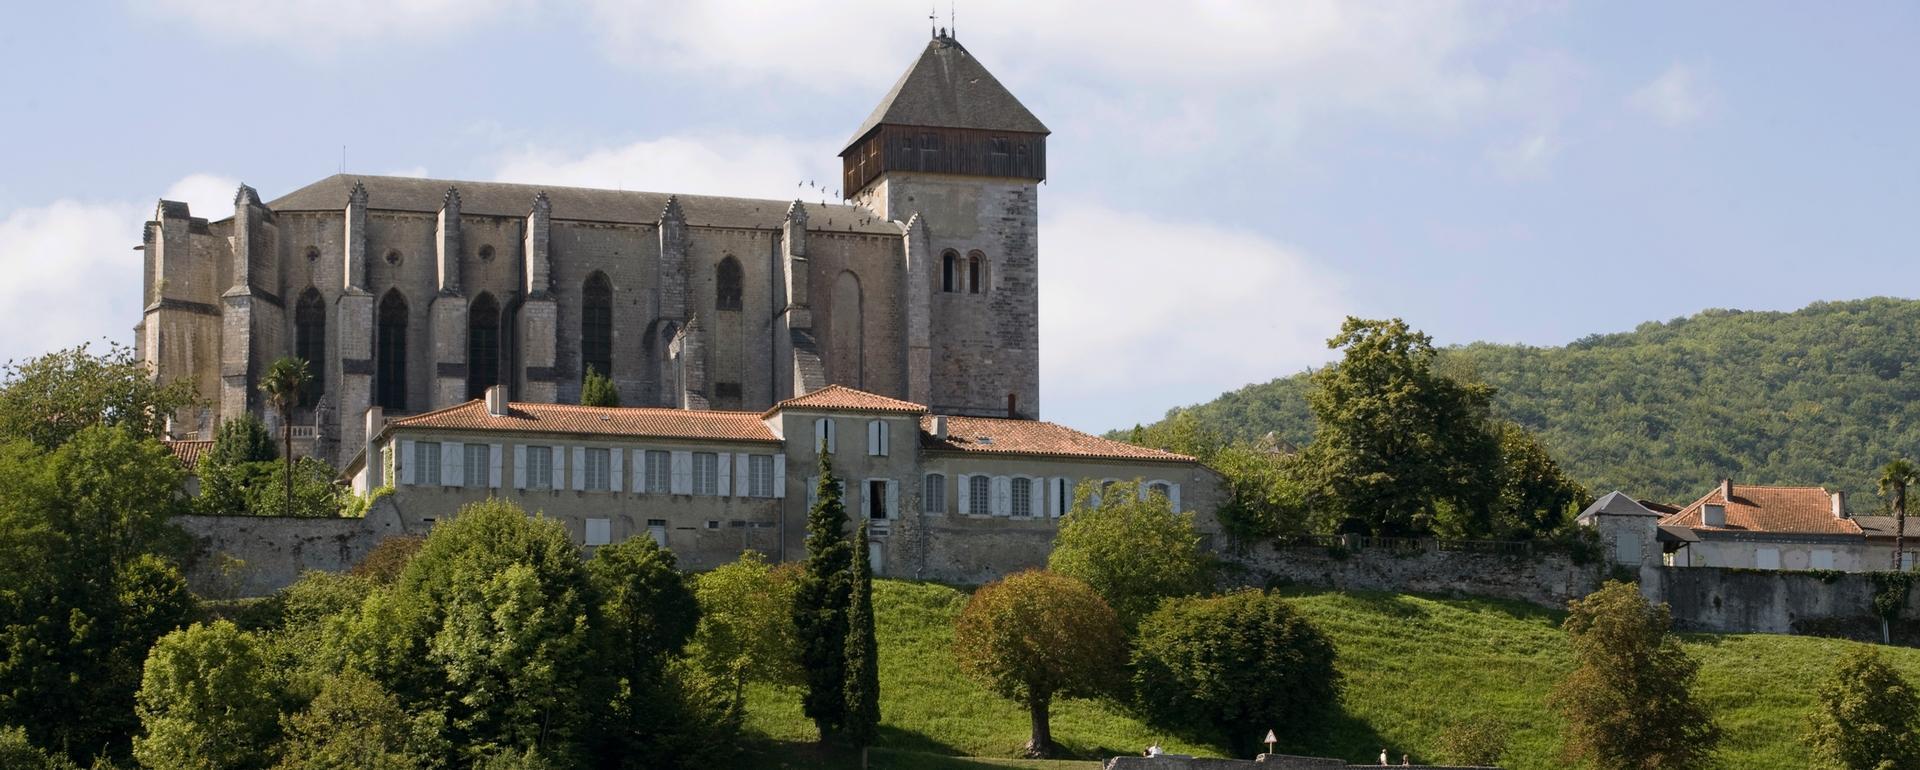 Cathédrale St Bertrand